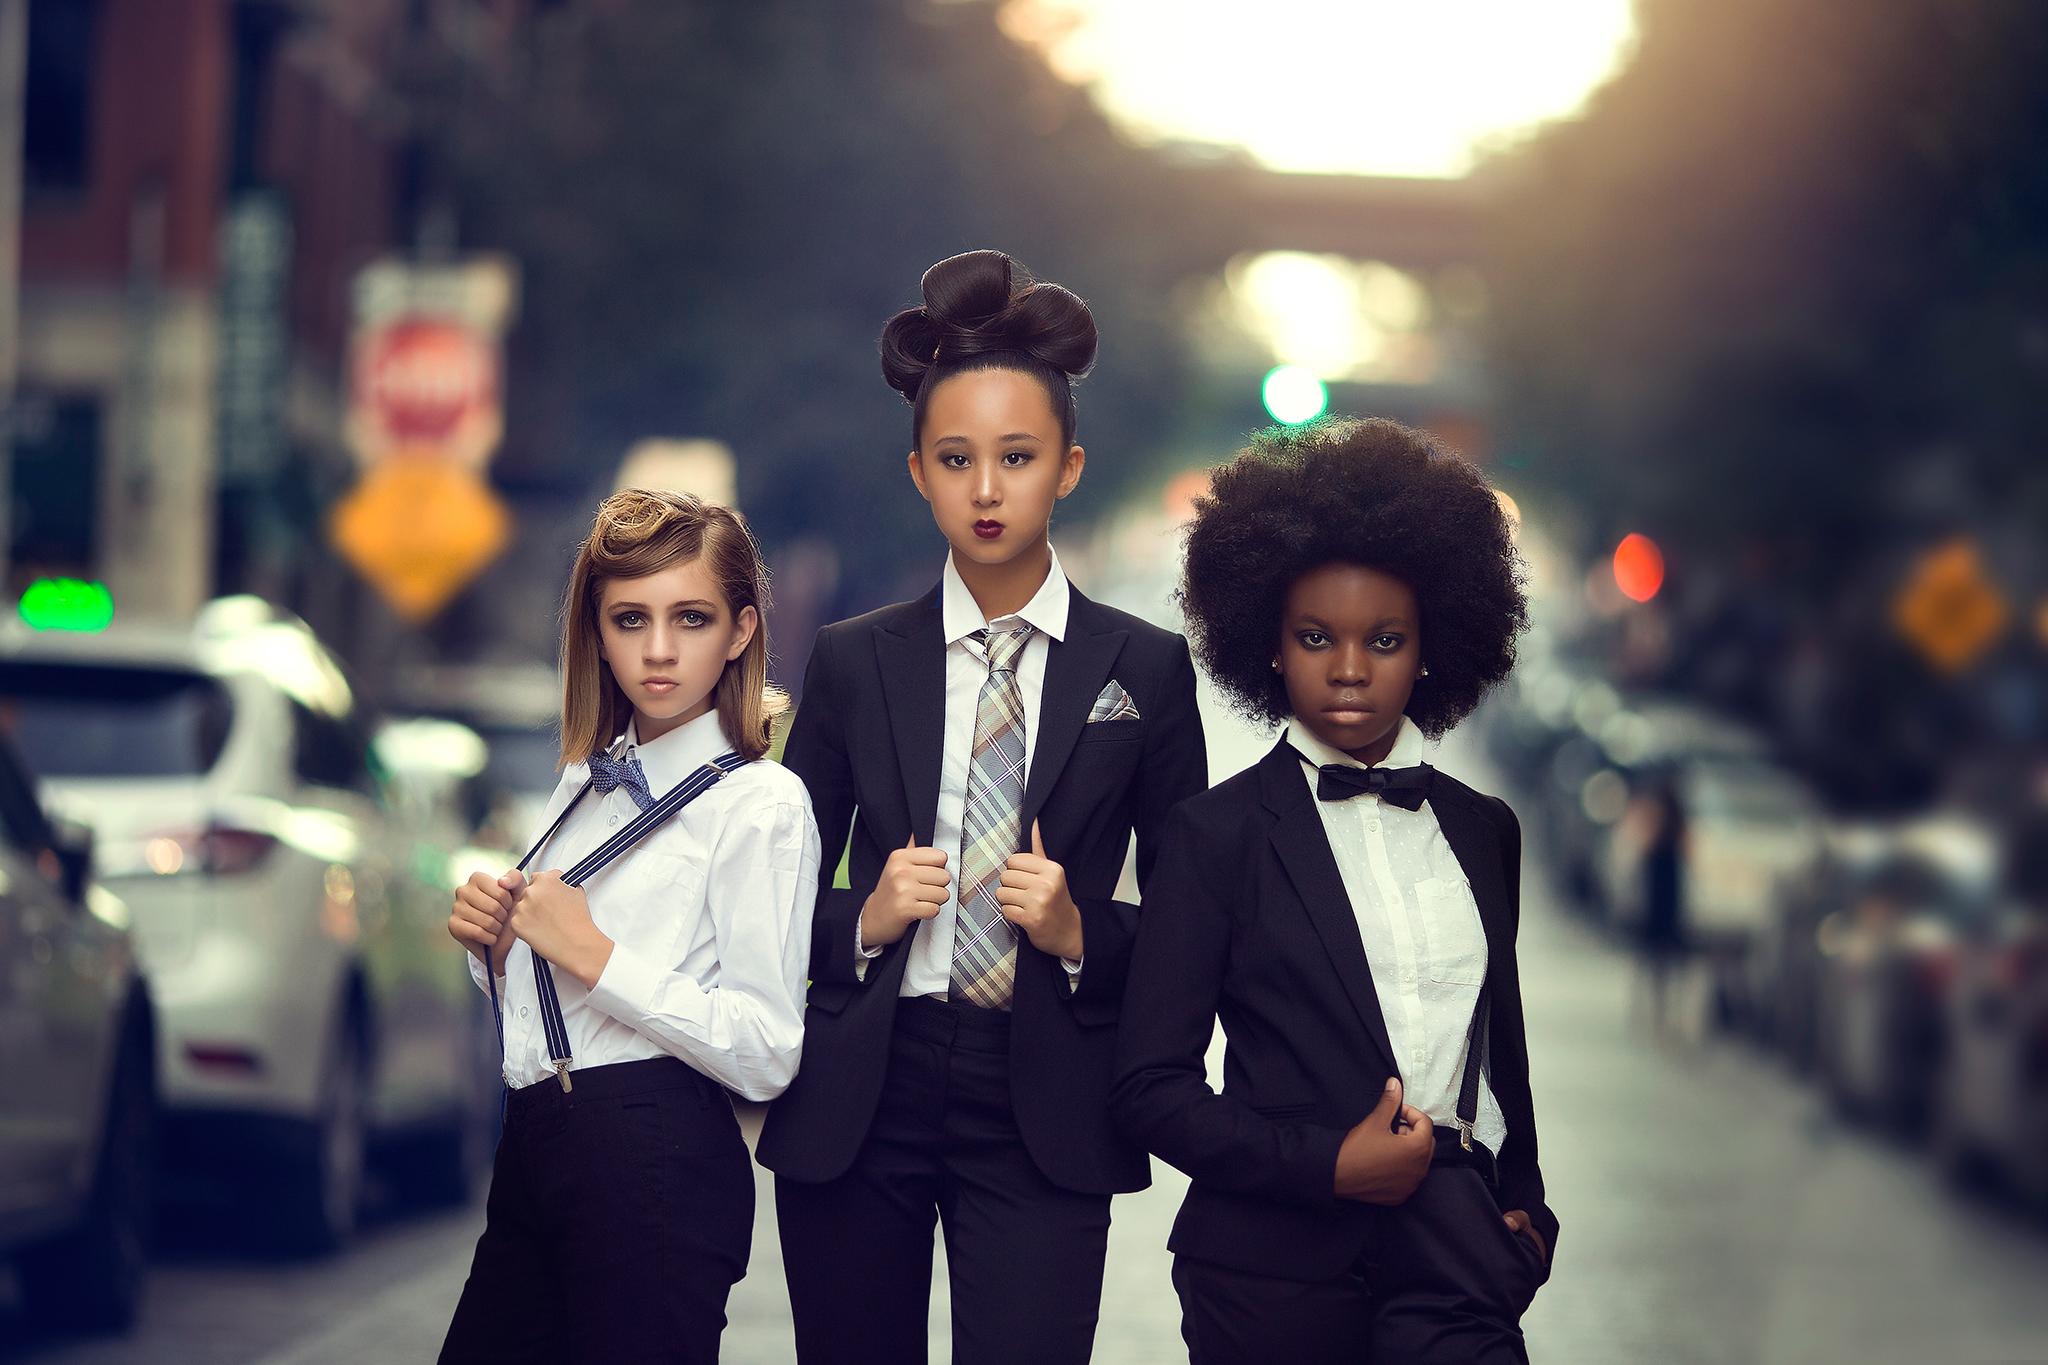 New York Photography workshop